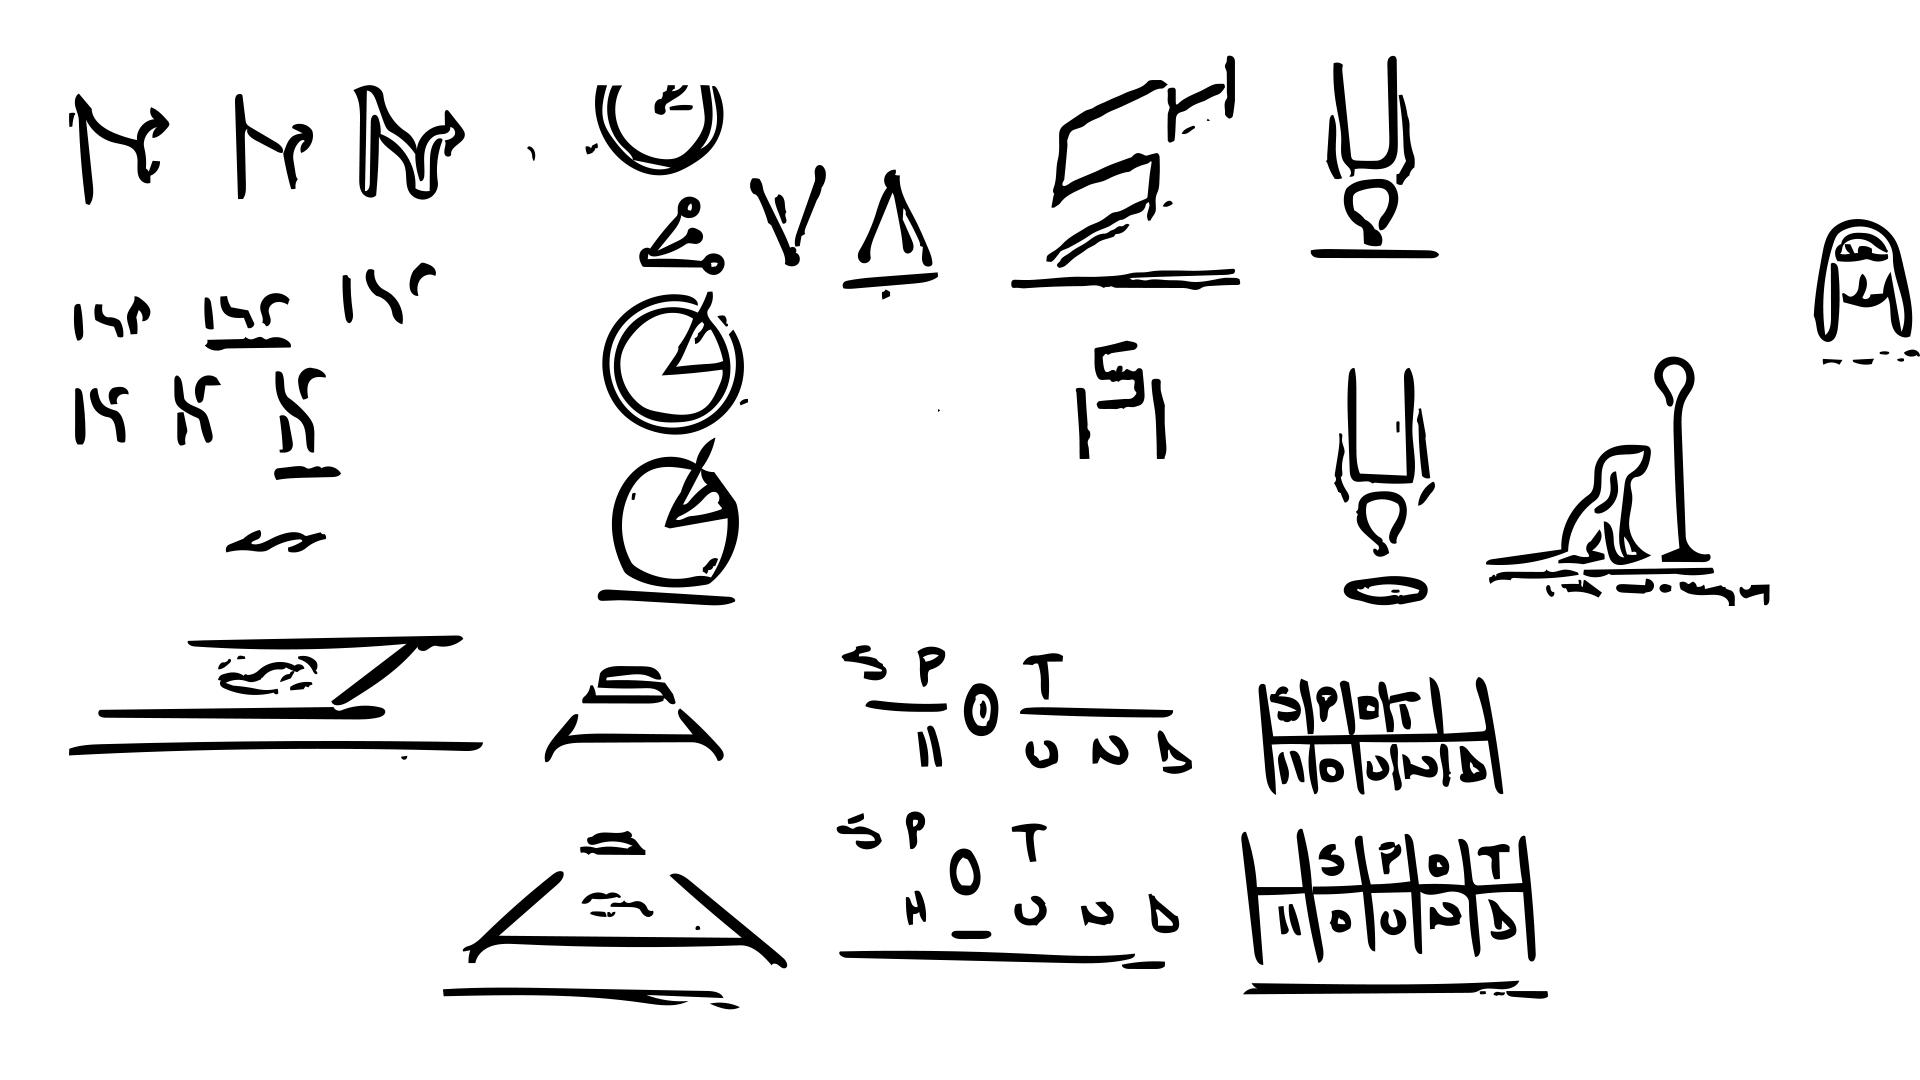 Ruff  sketches.